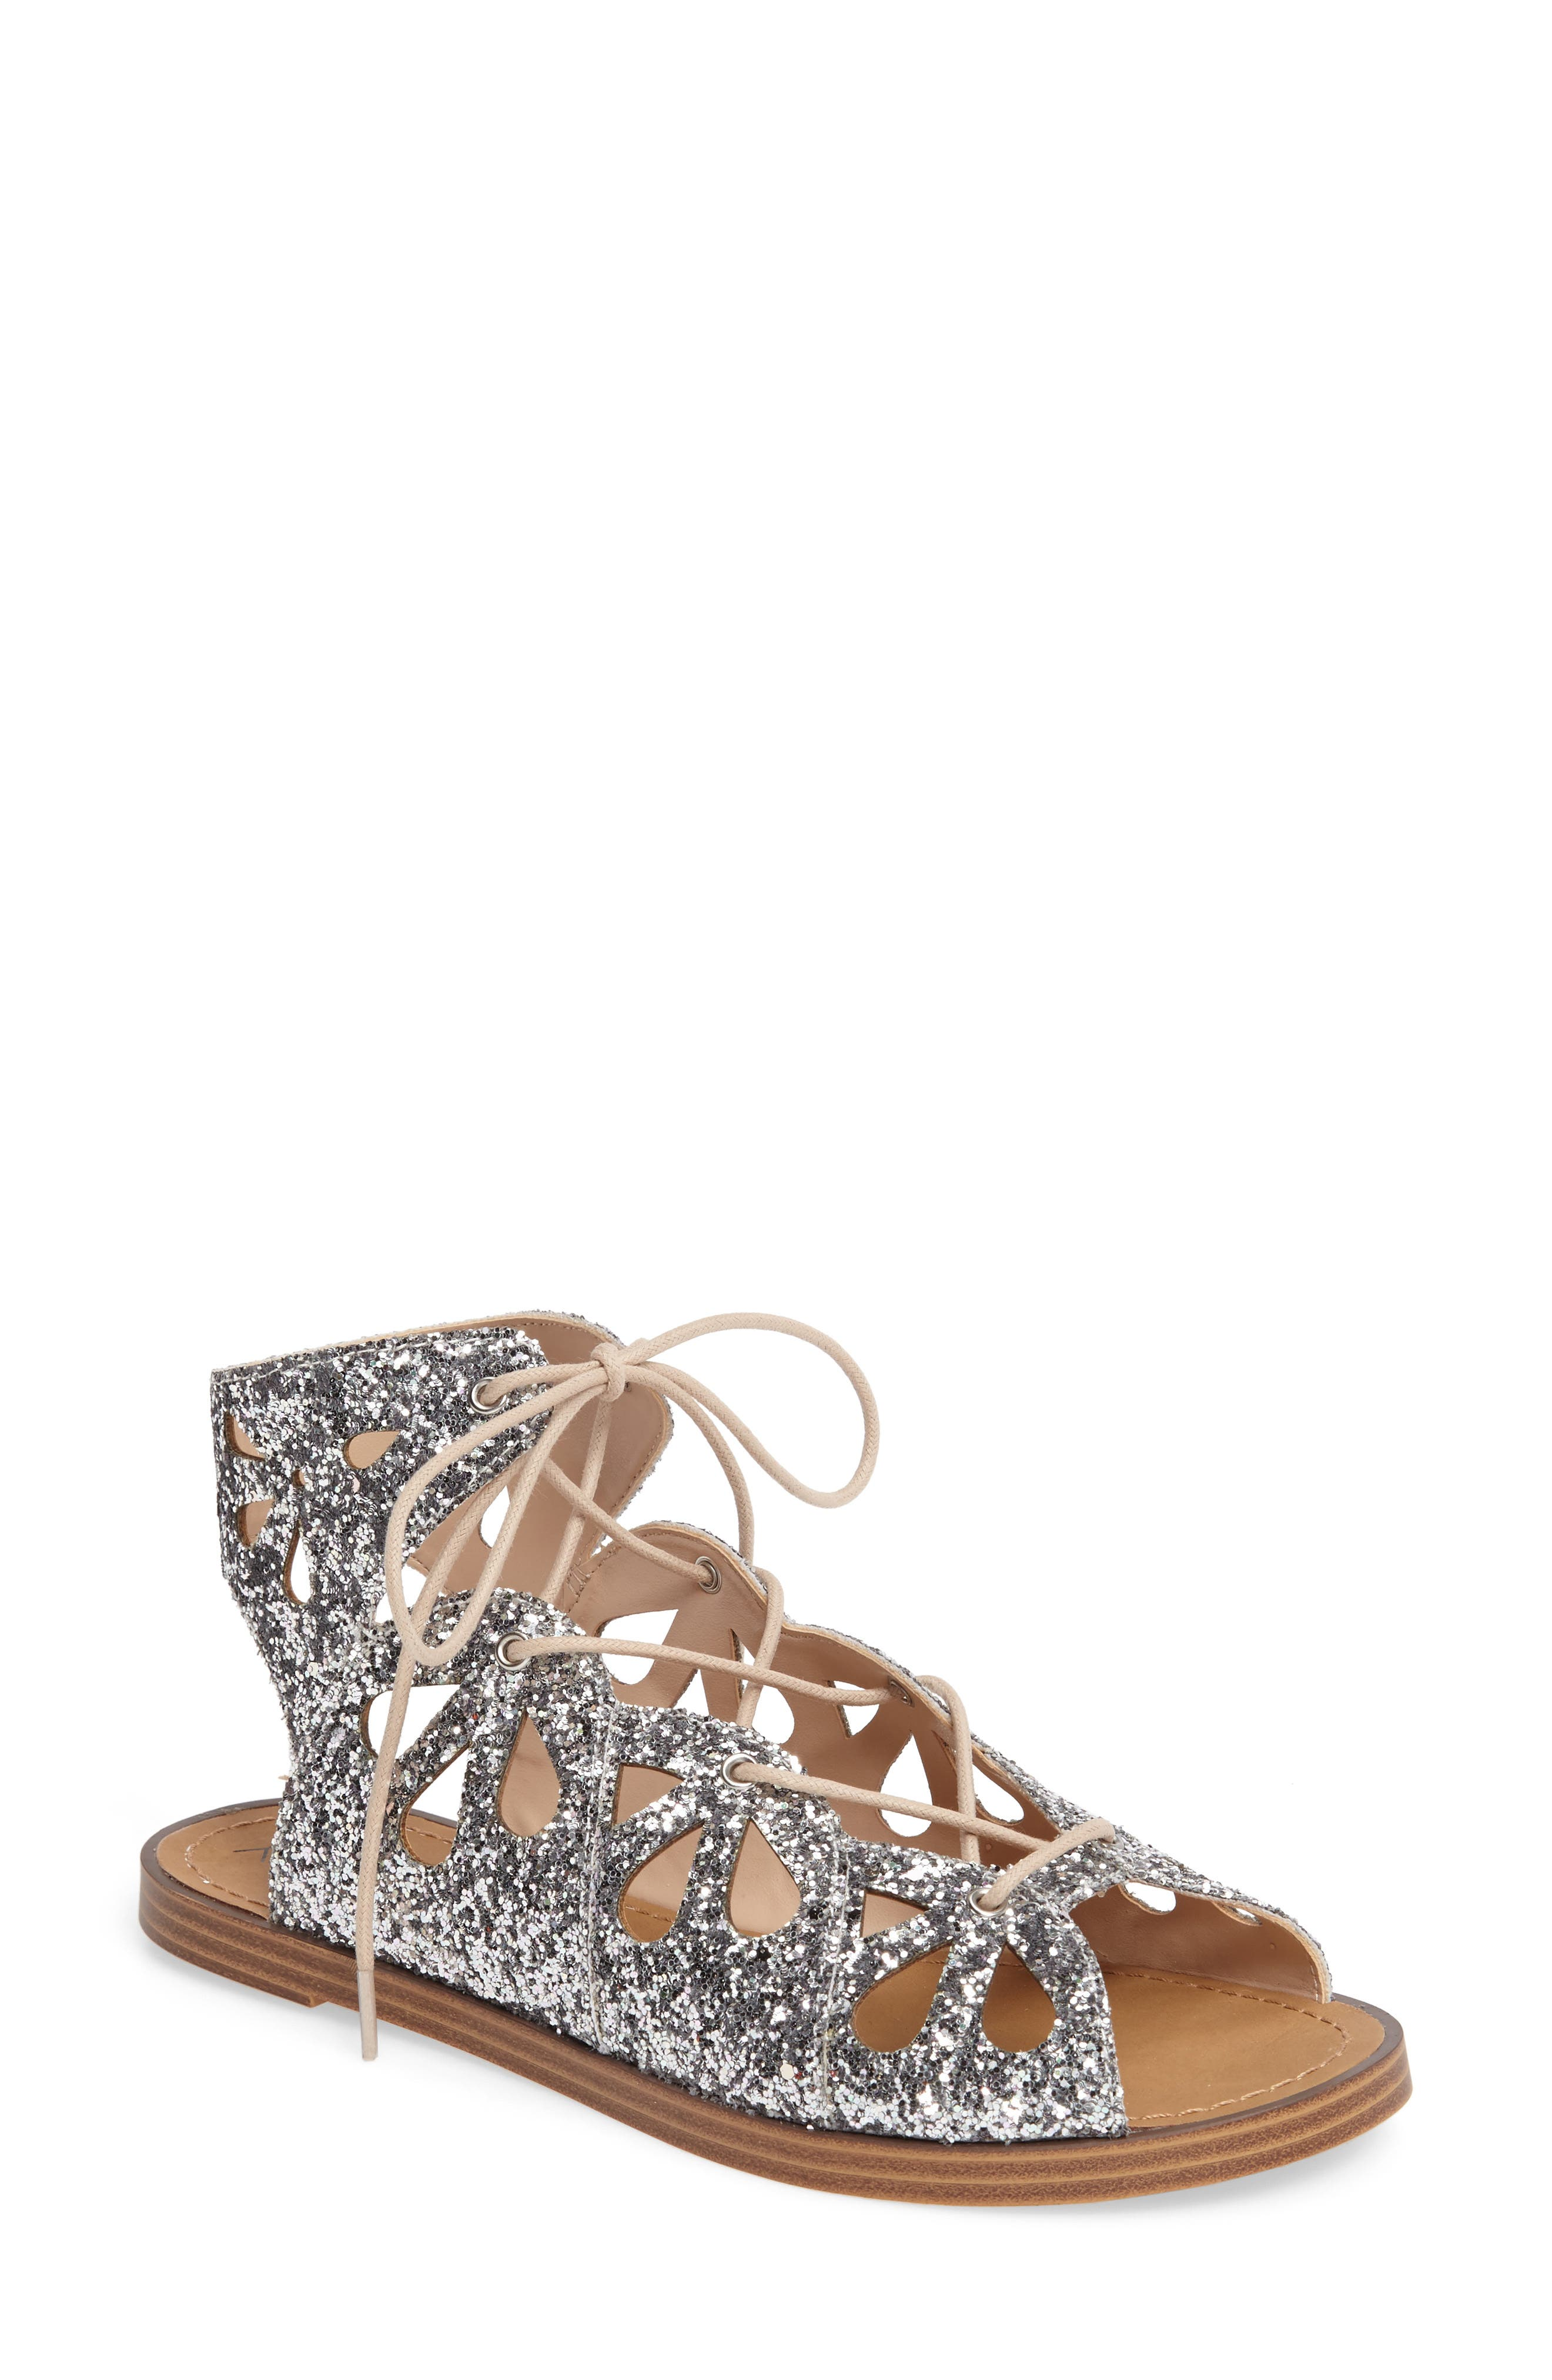 Lylia Glitter Sandal, Main, color, 040